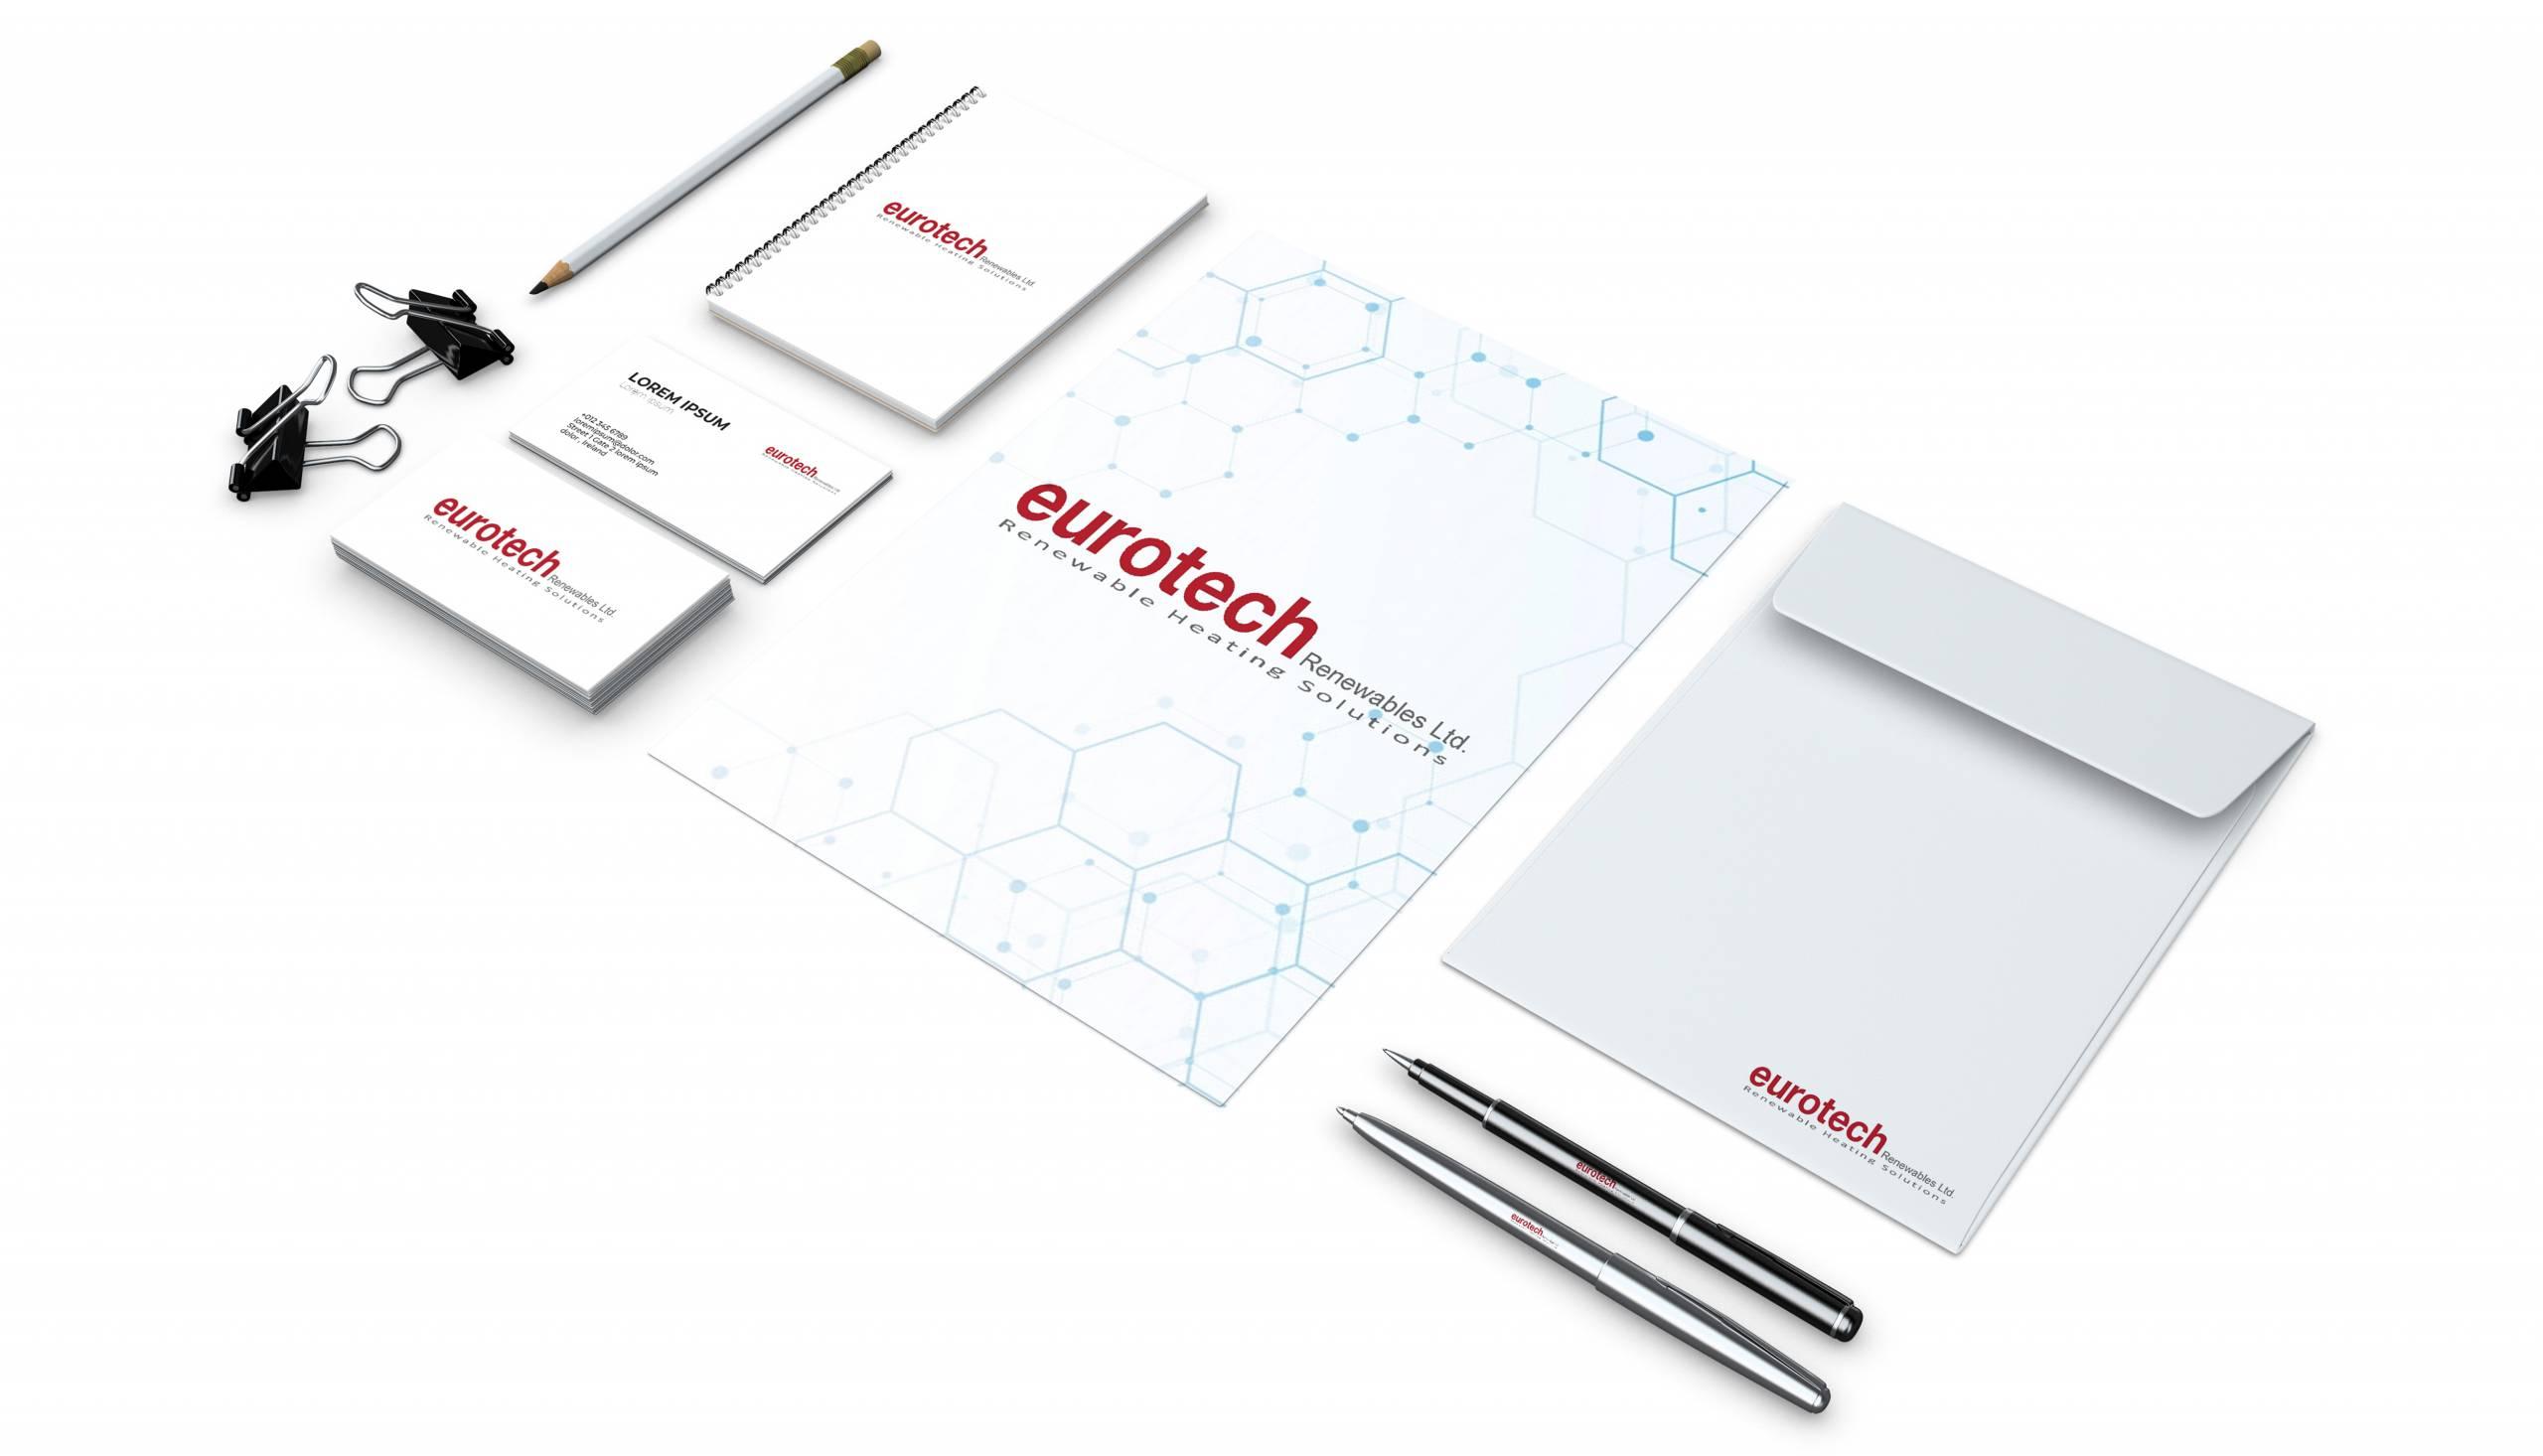 eurotech-8